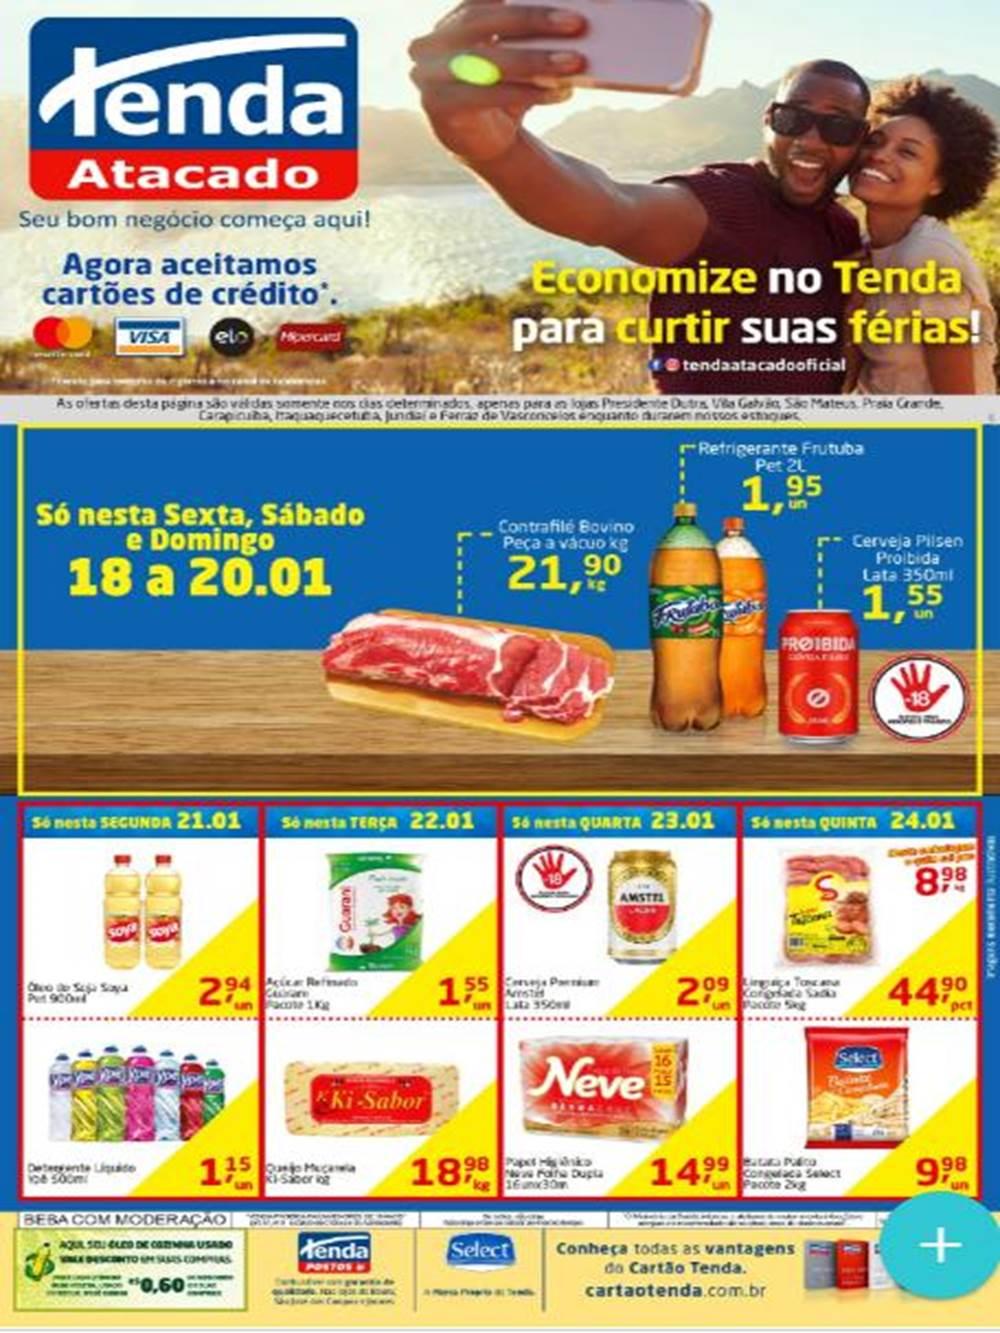 Ofertas-tenda1-3 Ofertas de Supermercados - Economize!